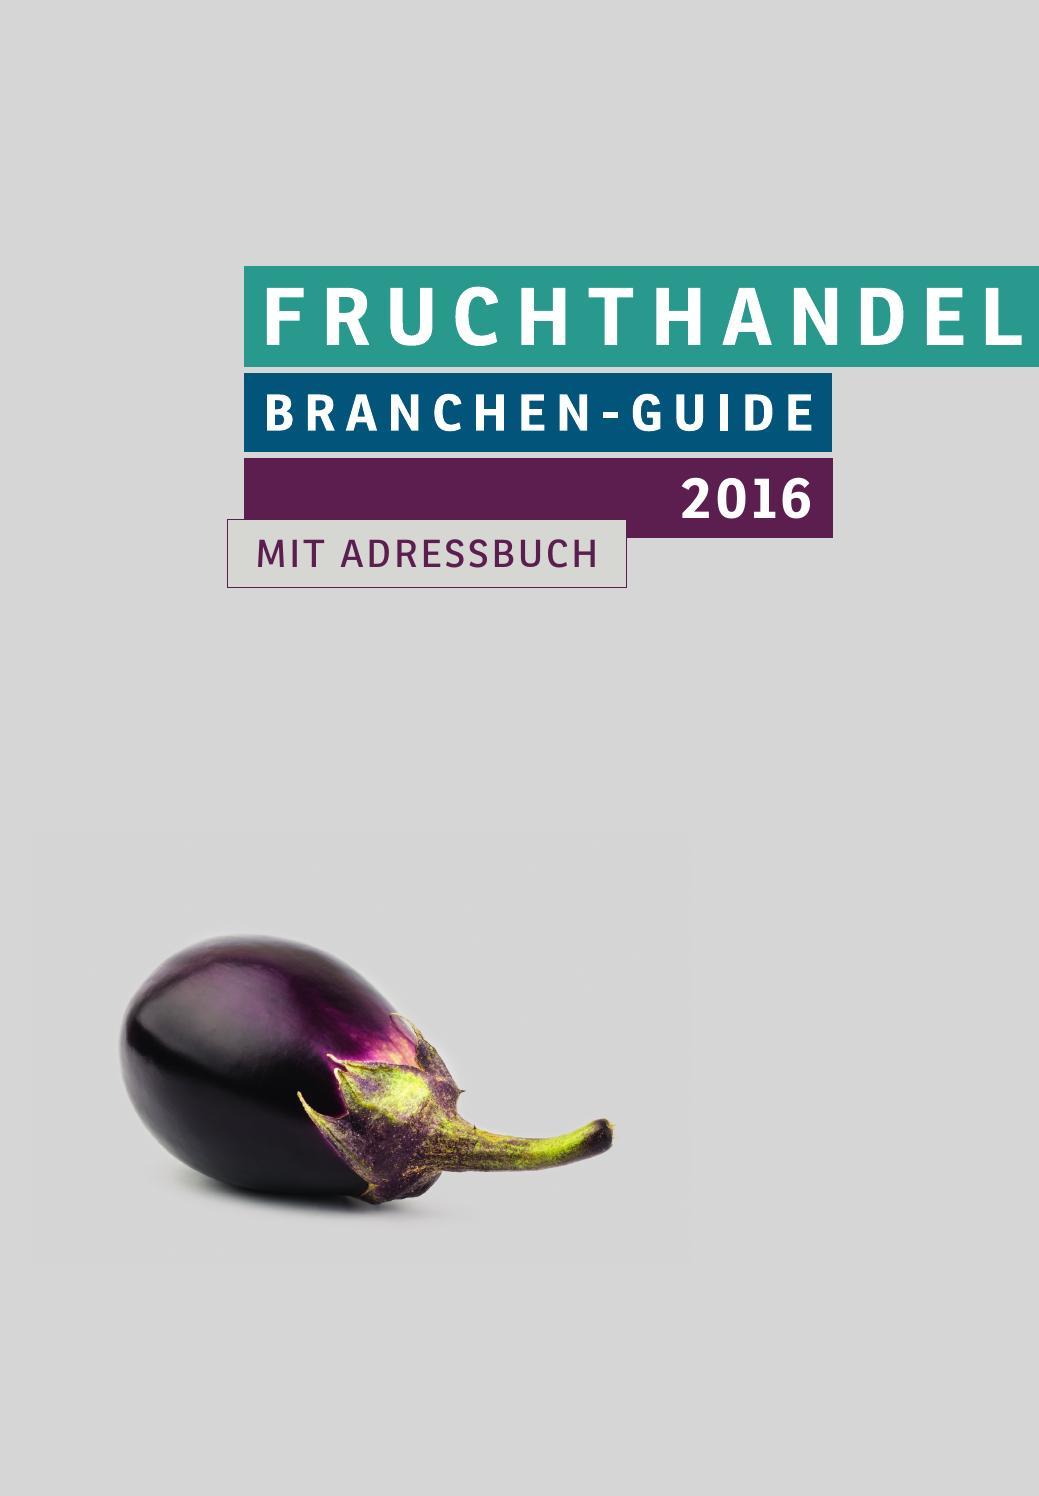 FRUCHTHANDEL Branchen Guide 8 by Fruchthandel Magazin   issuu